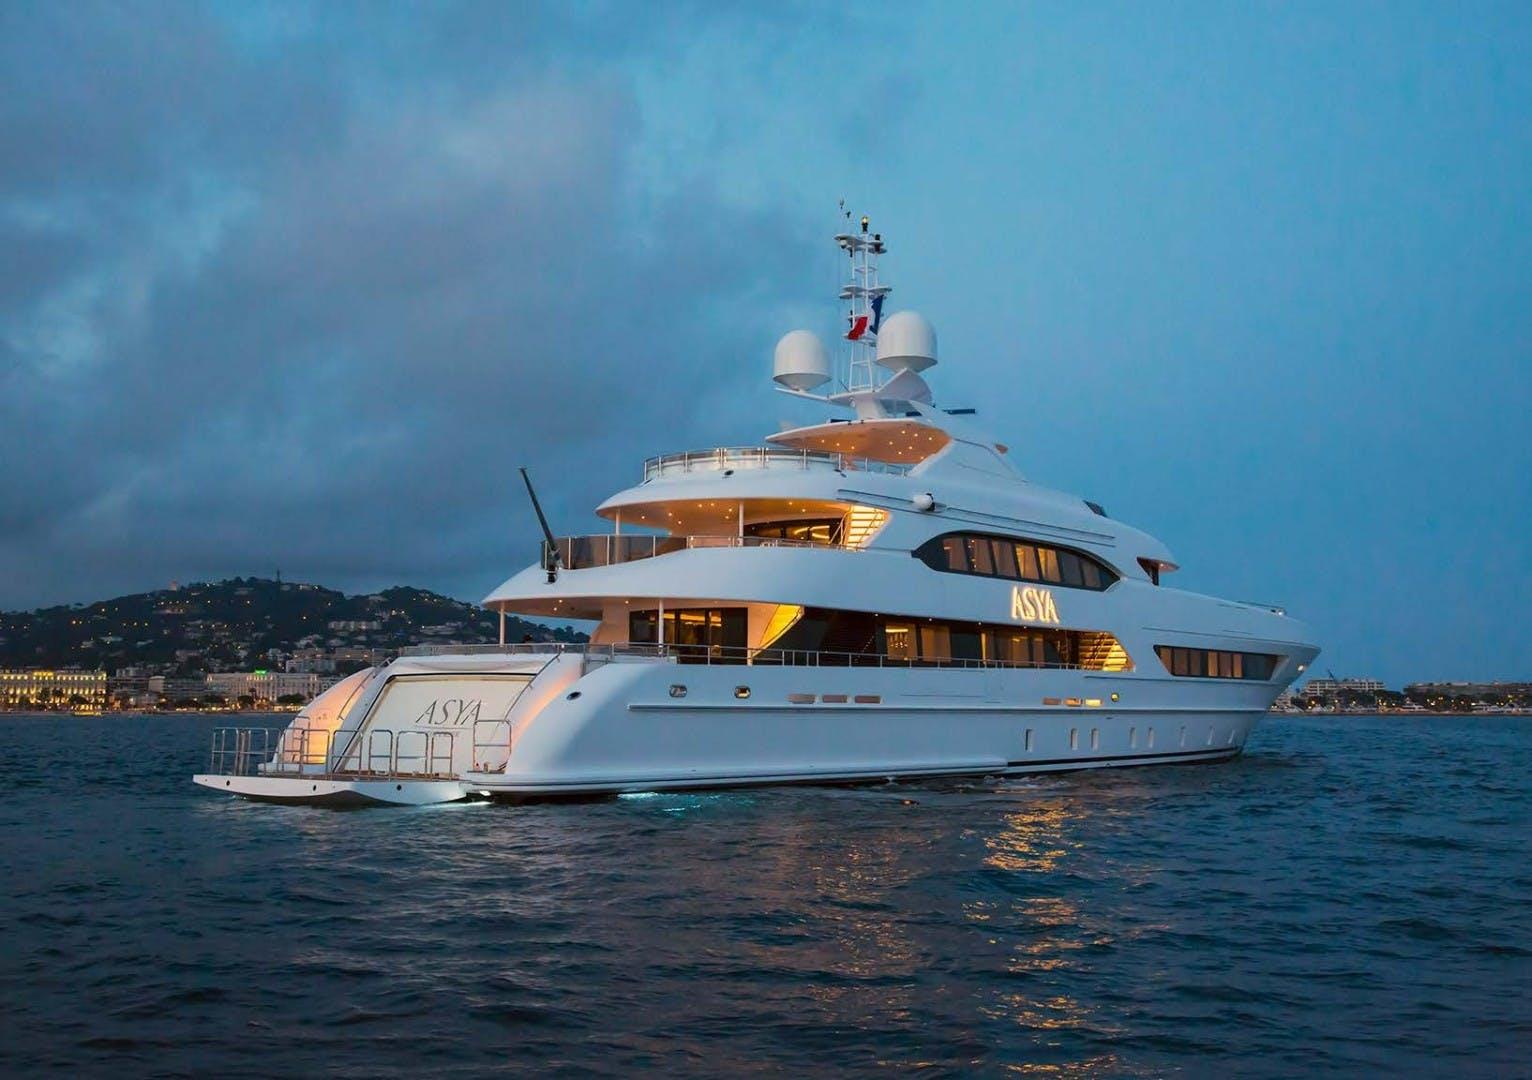 2015 Heesen Yachts 154'  ASYA | Picture 2 of 17